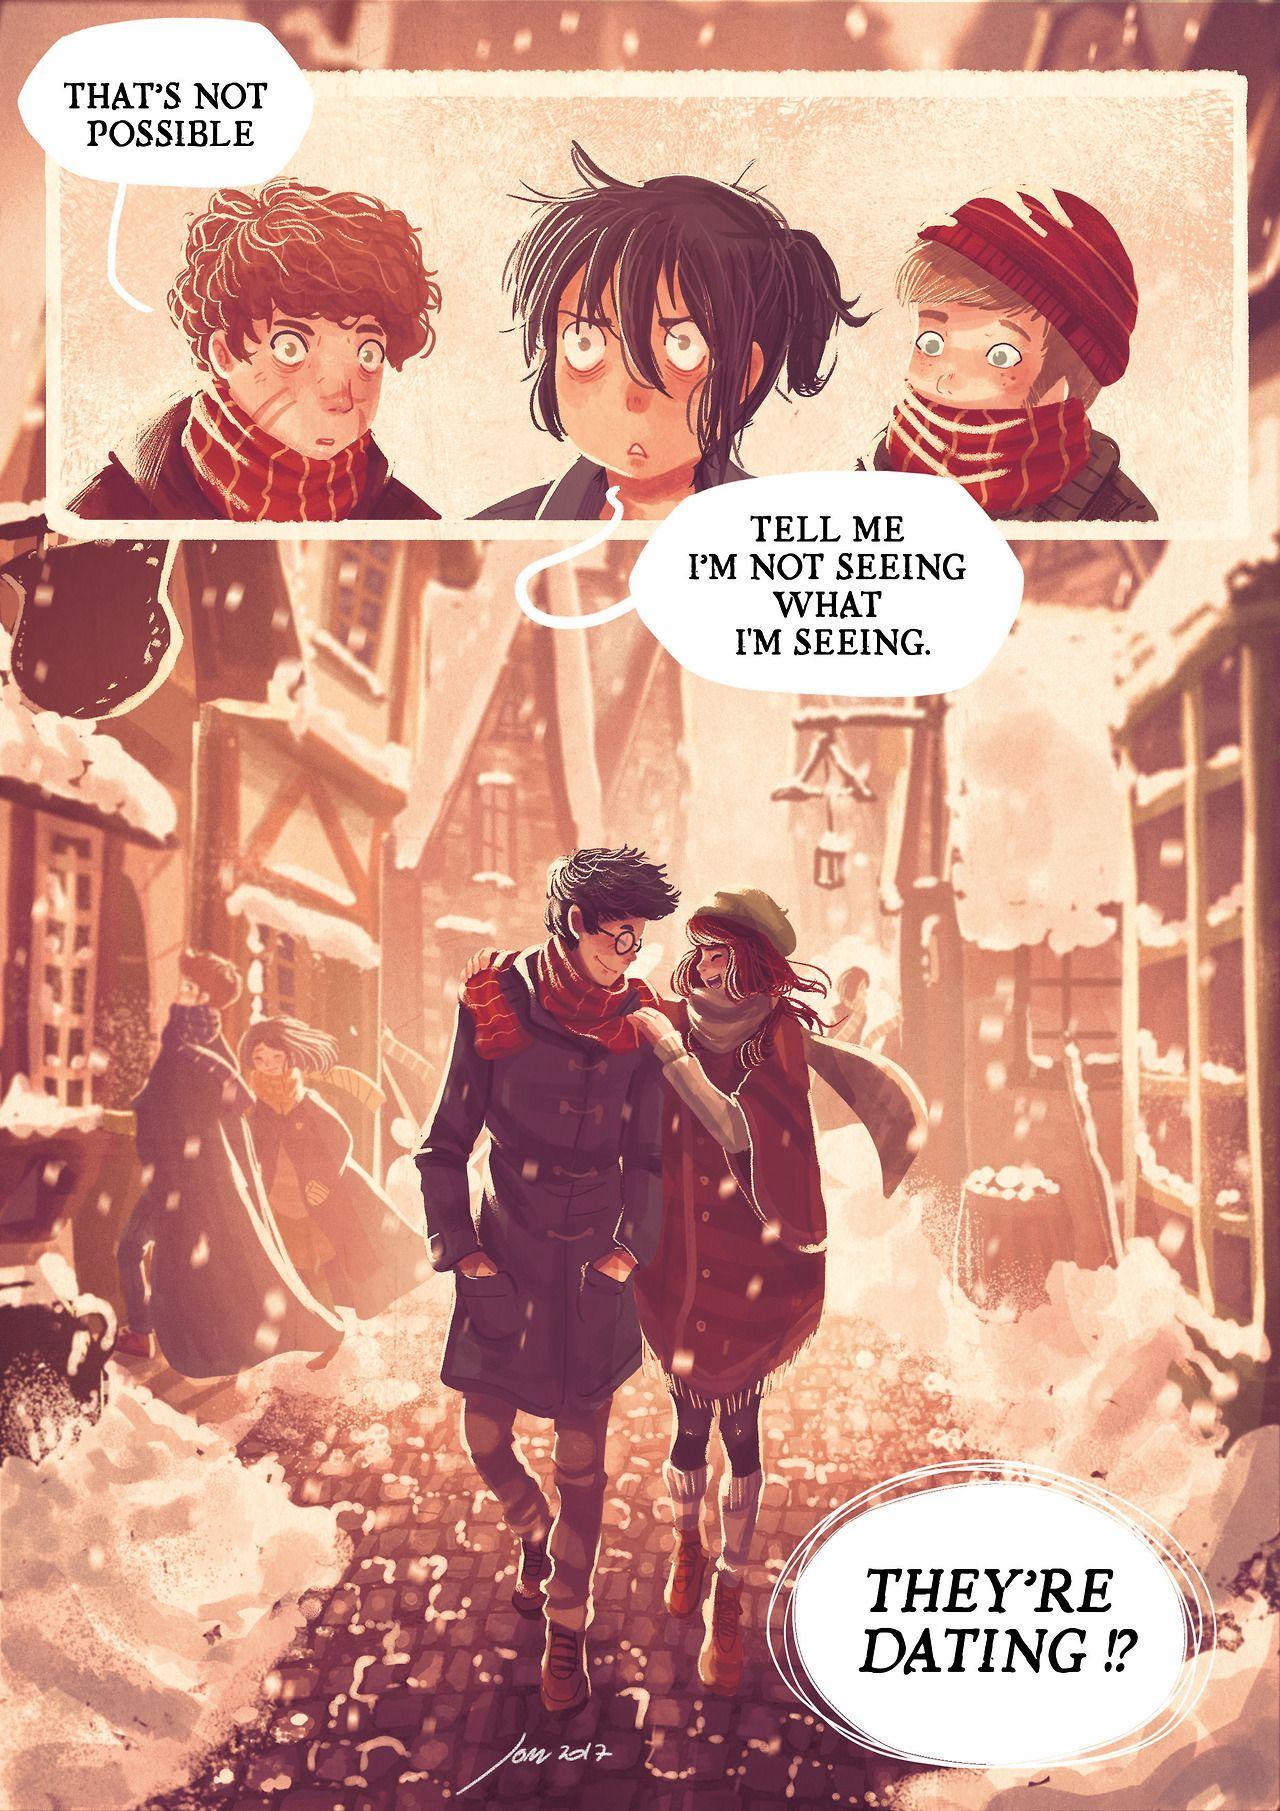 Talksy O Trzech Glupich I Jednym Madrym Czyli Huncwotach Harry Potter Comics Harry Potter Anime Lily Potter